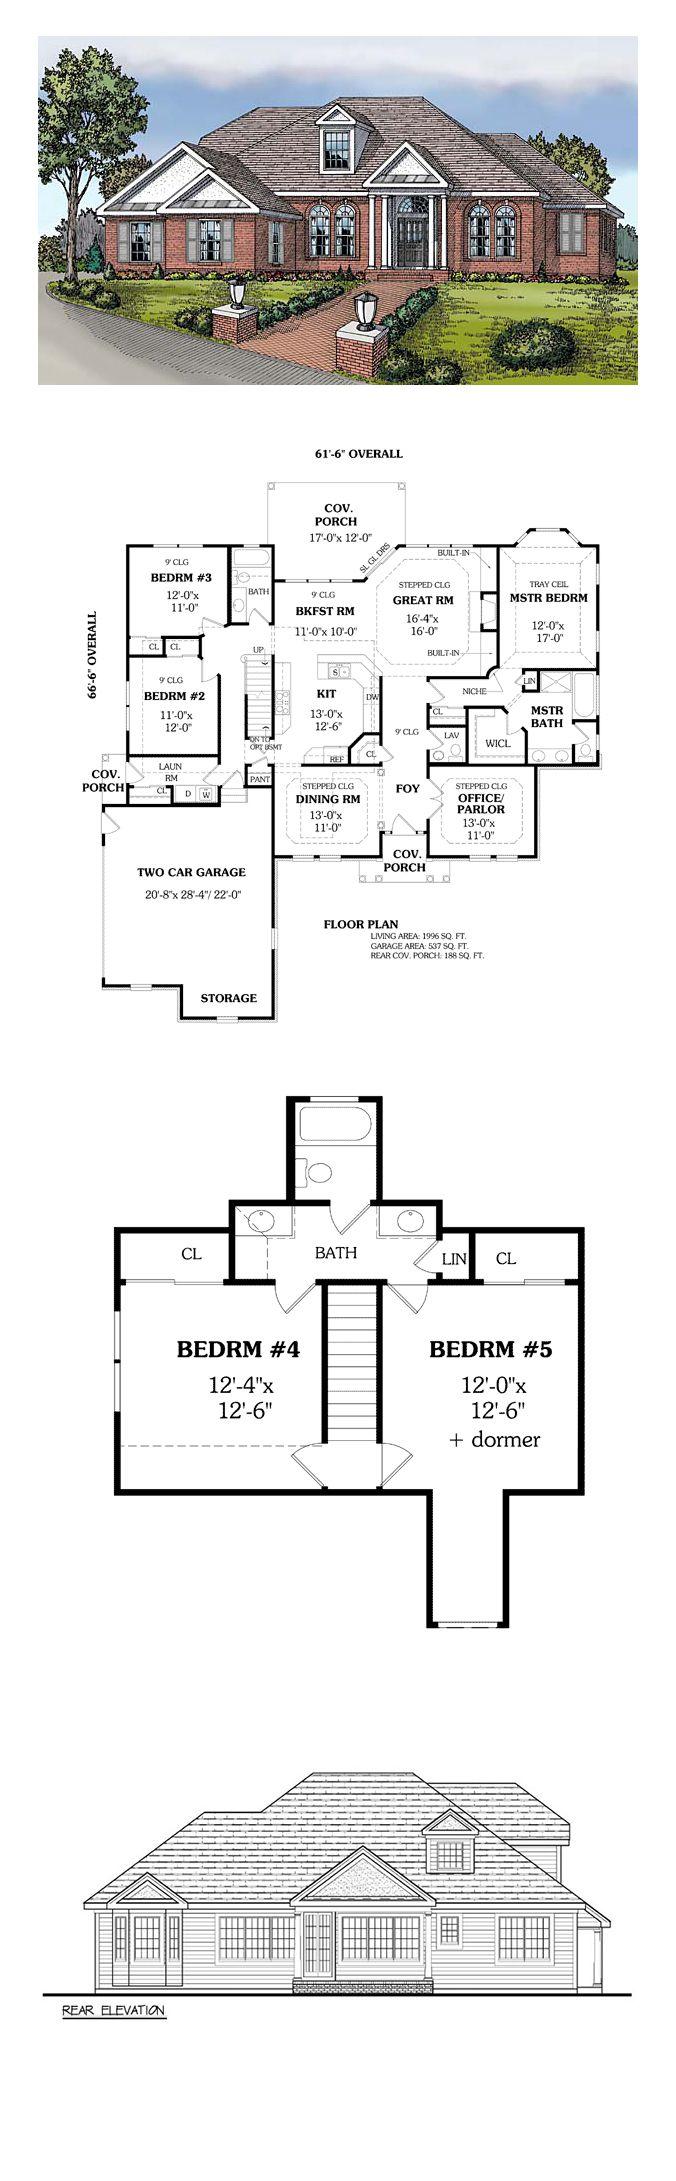 65 best european house plans images on pinterest european house colonial european traditional house plan 69509